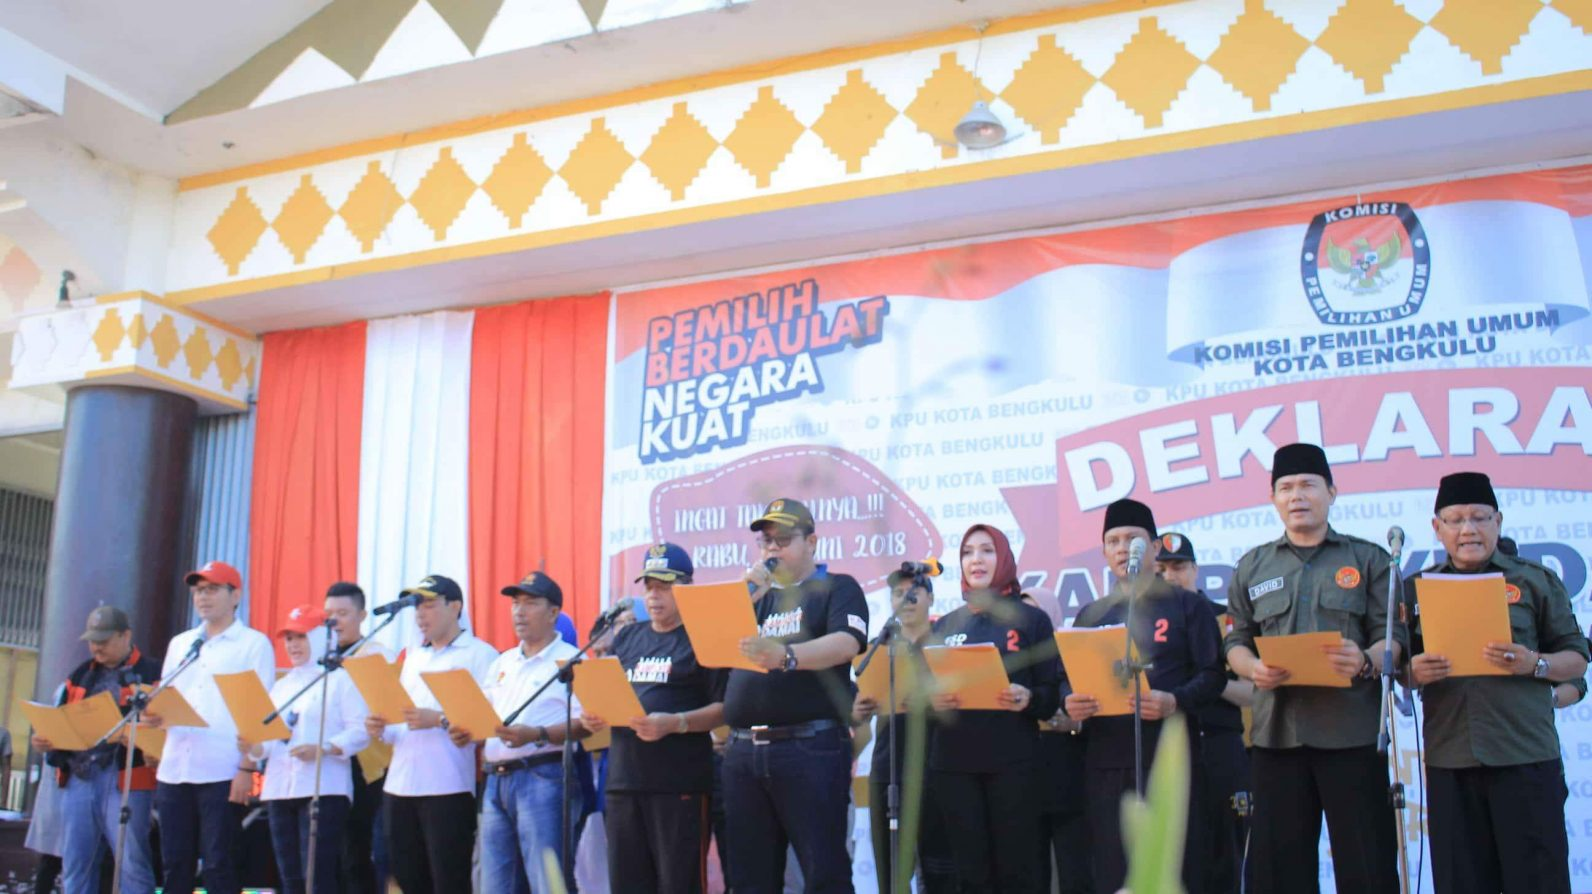 Deklarasi Pilkada Damai, Anti Hoak dan Money Politik Kota Bengkulu